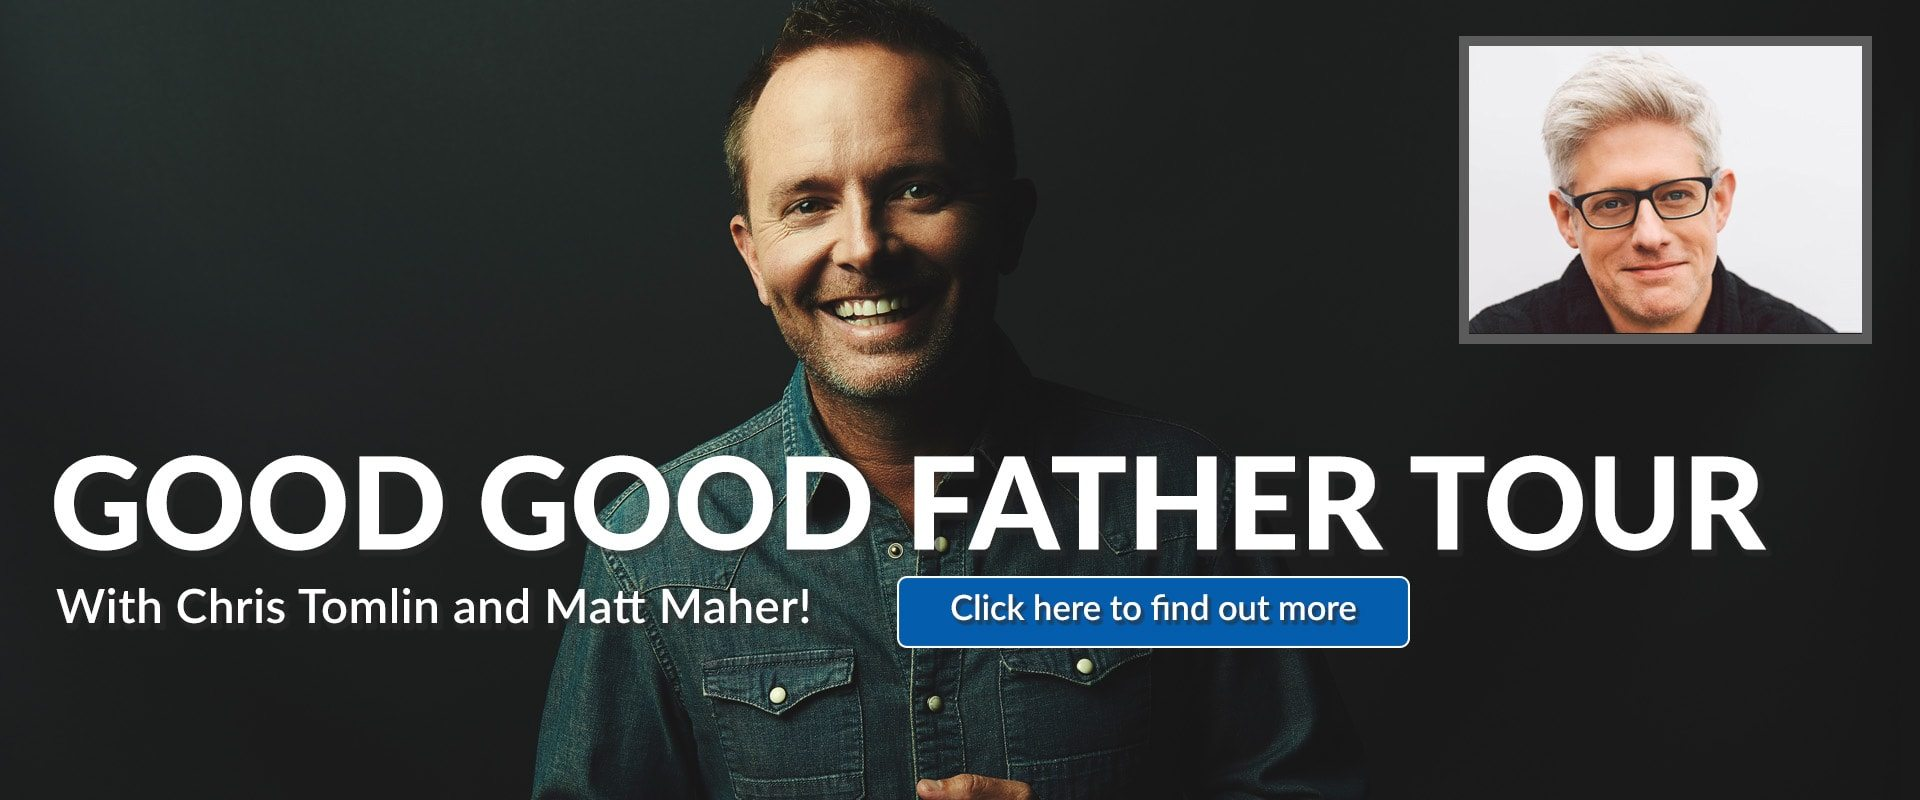 91.3 KGLY East Texas Christian Radio Chris Tomlin Matt Maher Good Good Father Tour